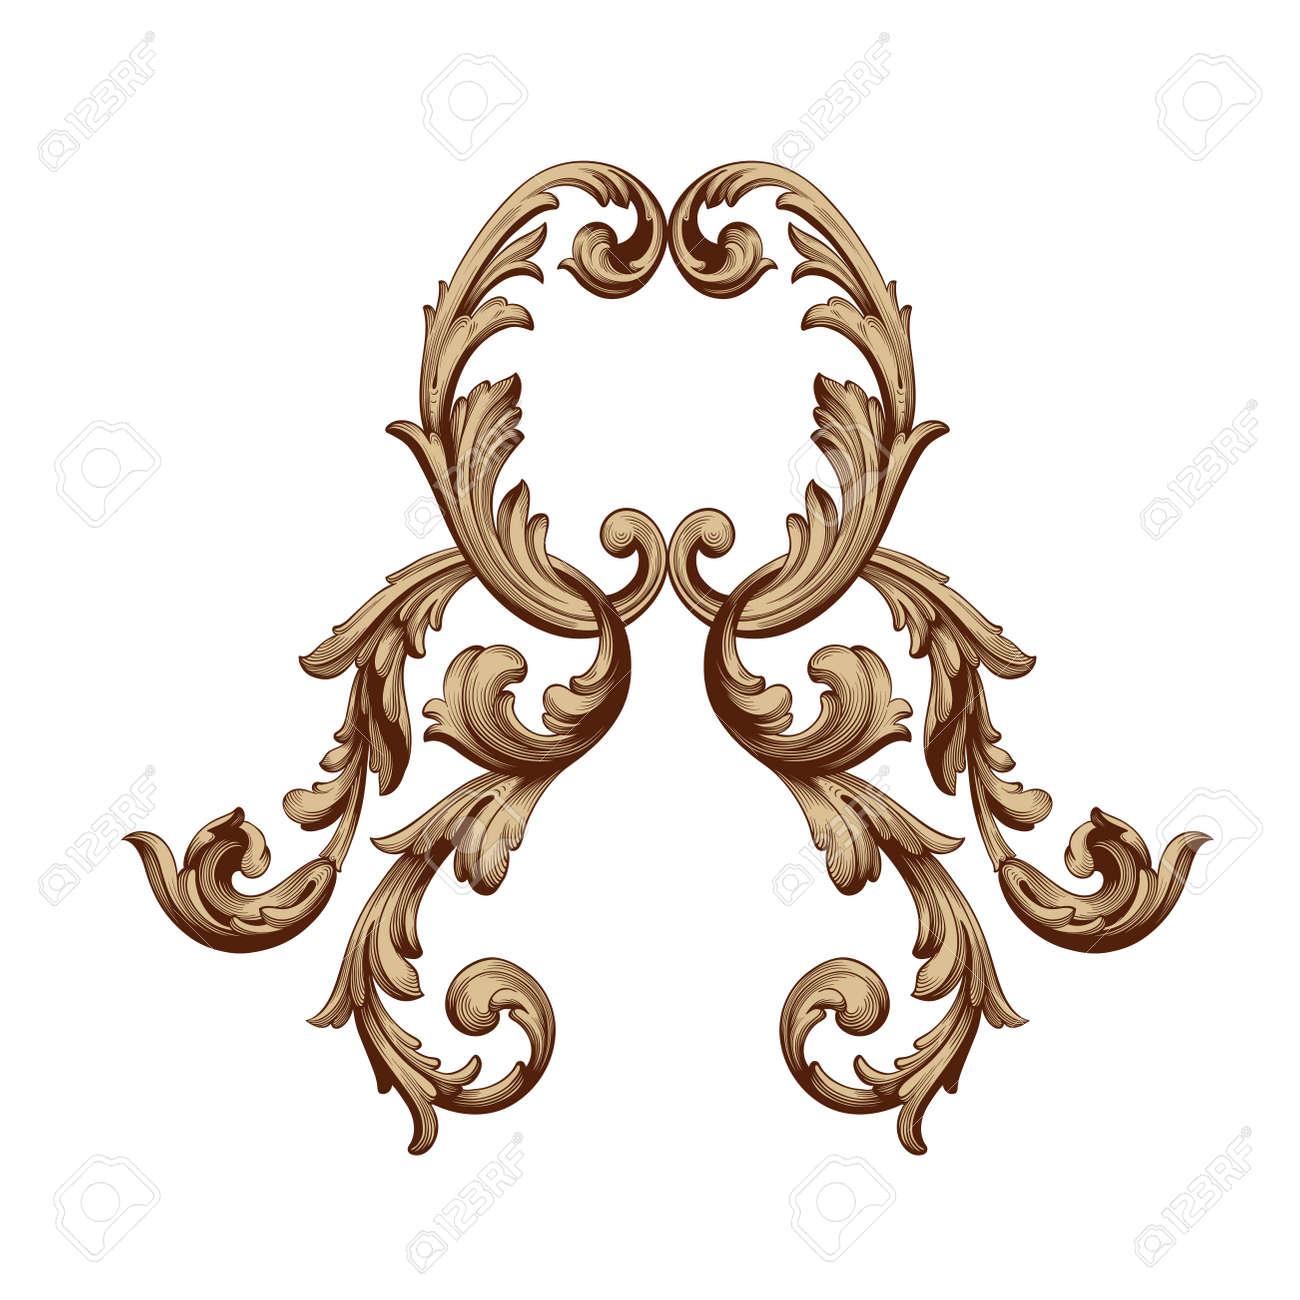 baroque vector set of vintage elements for design decorative rh 123rf com filigree vector line filigree vector free